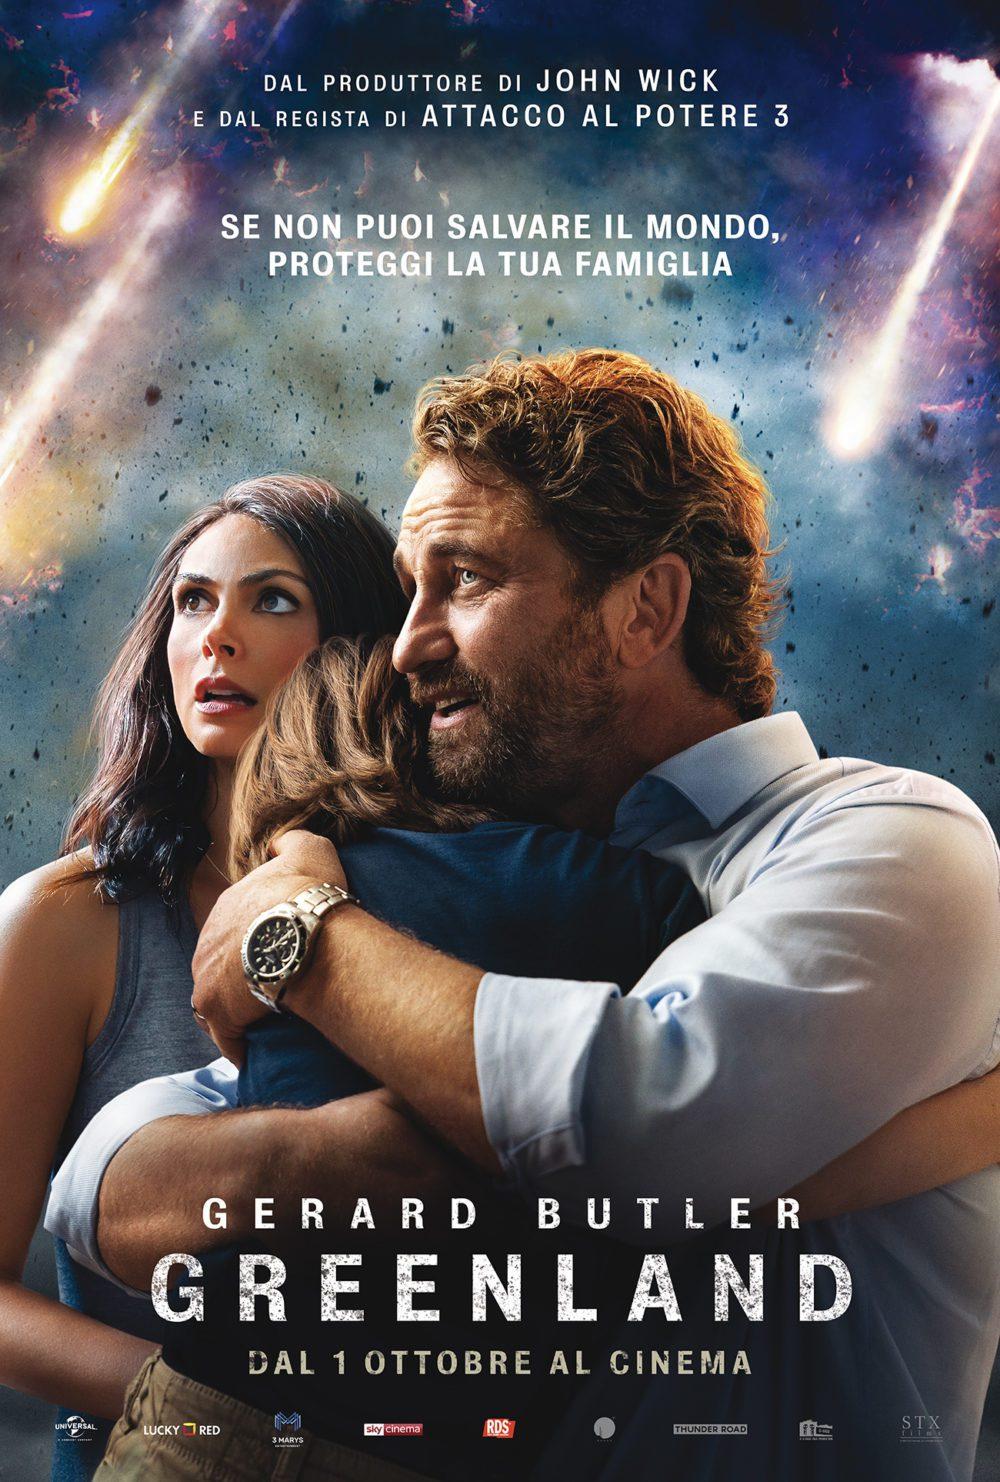 Greenland - Gerard Butler - Poster Ita